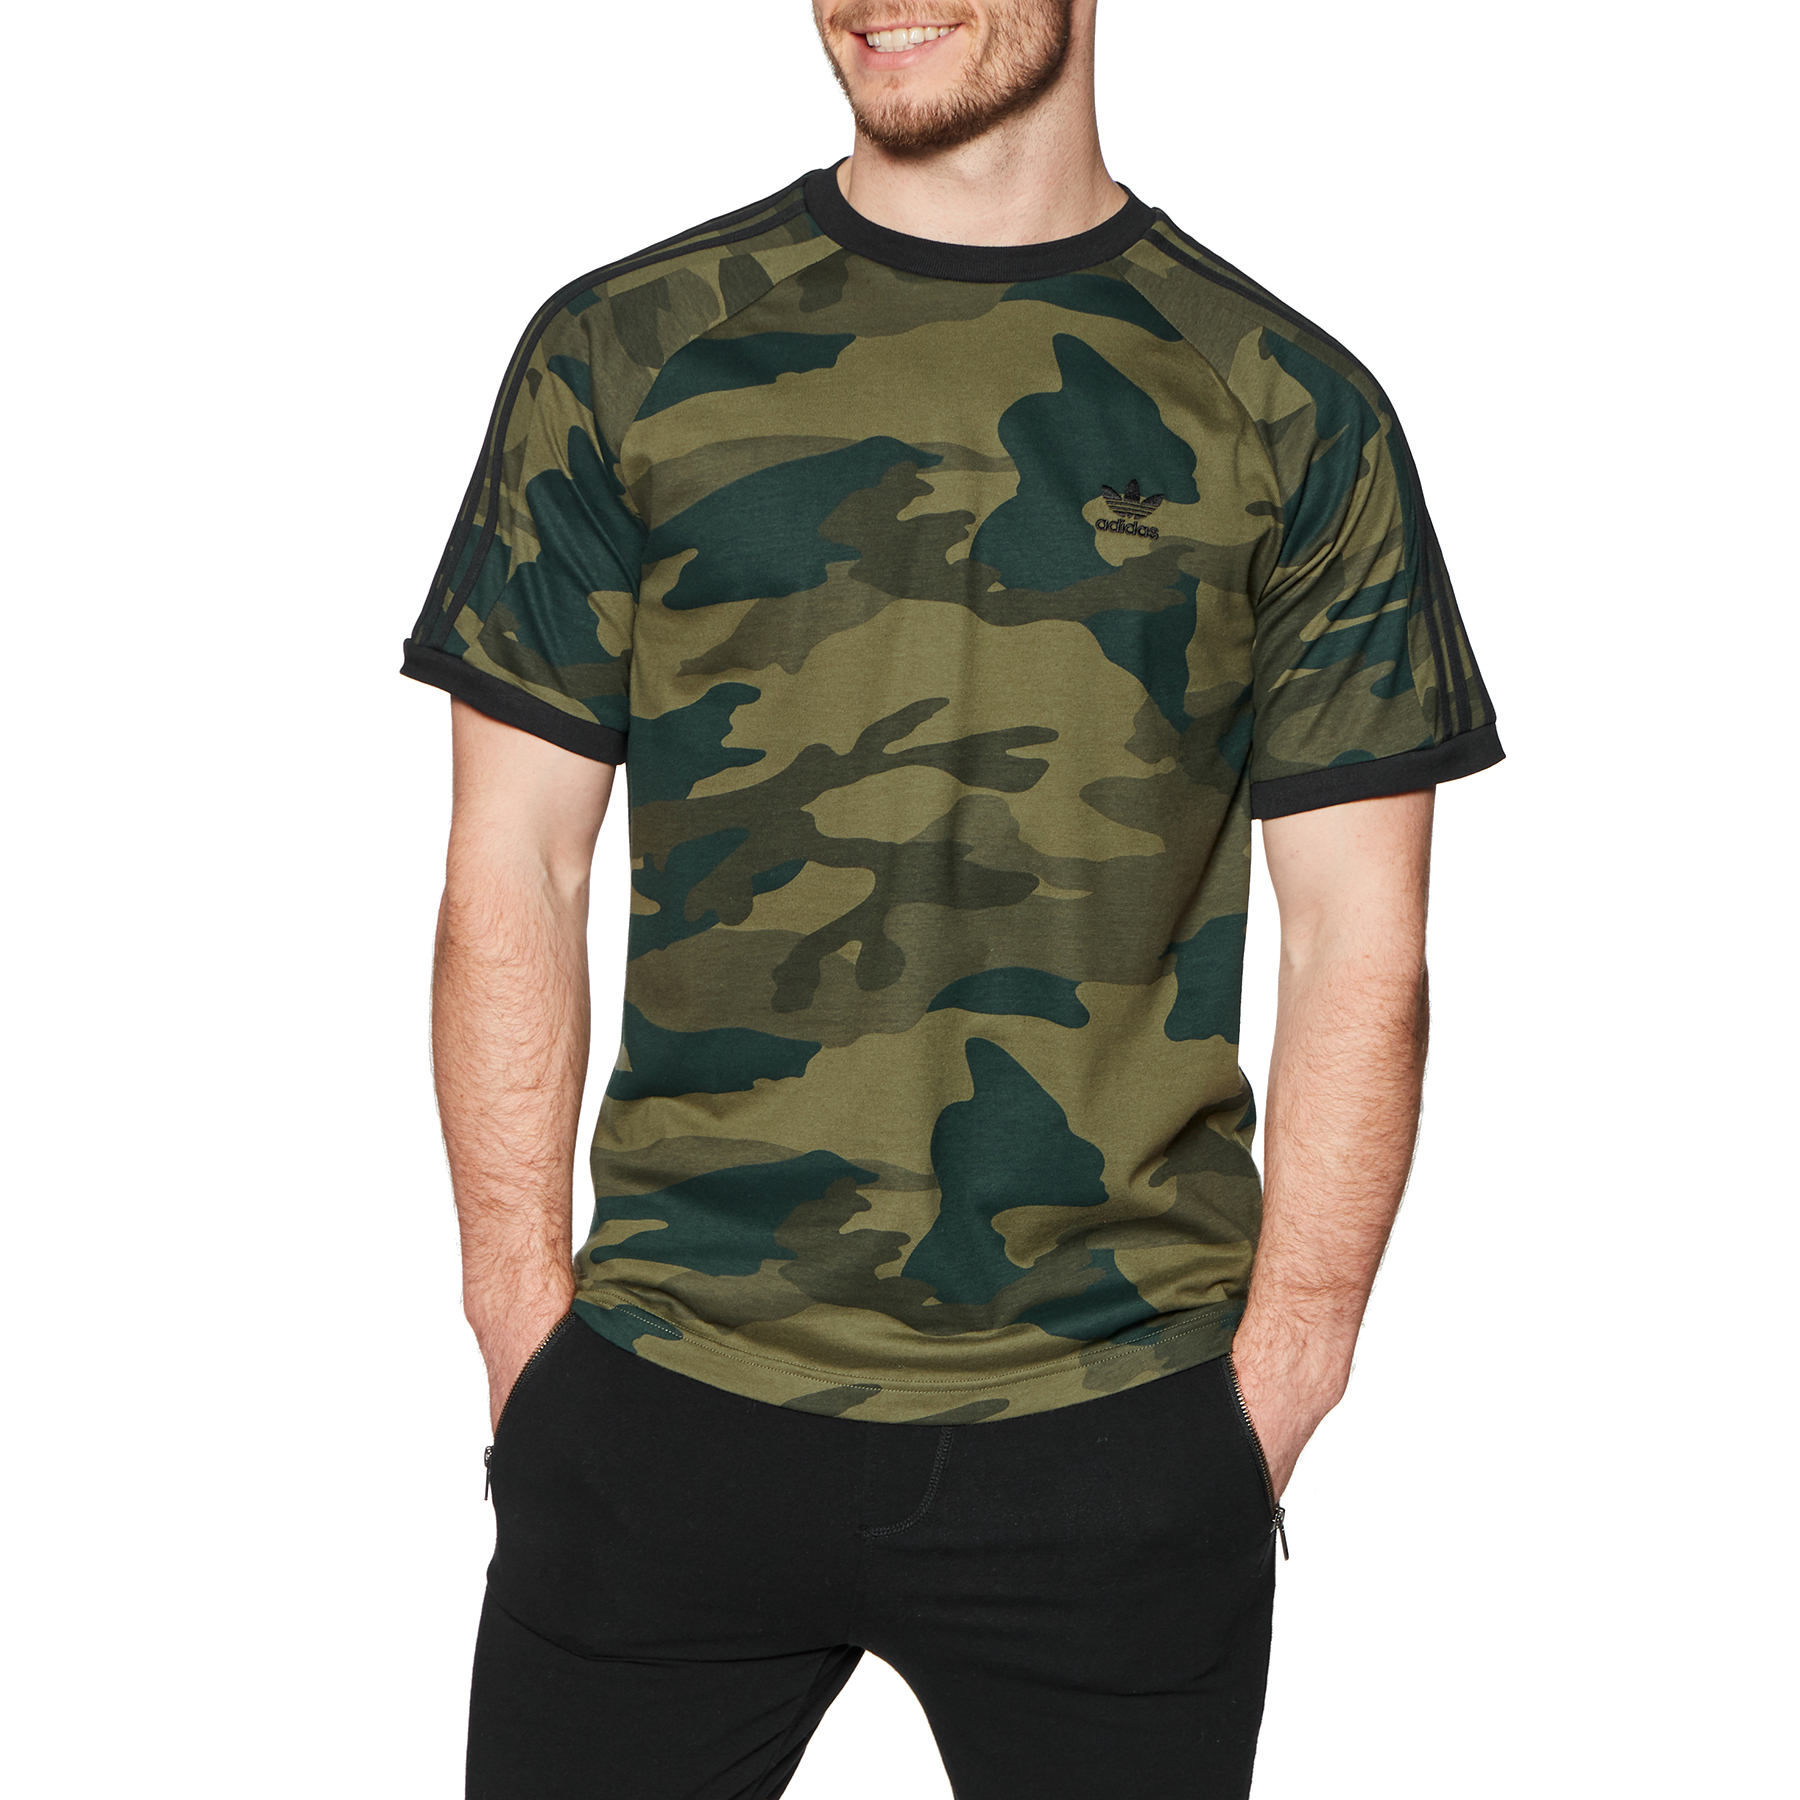 camao tee shirt adidas